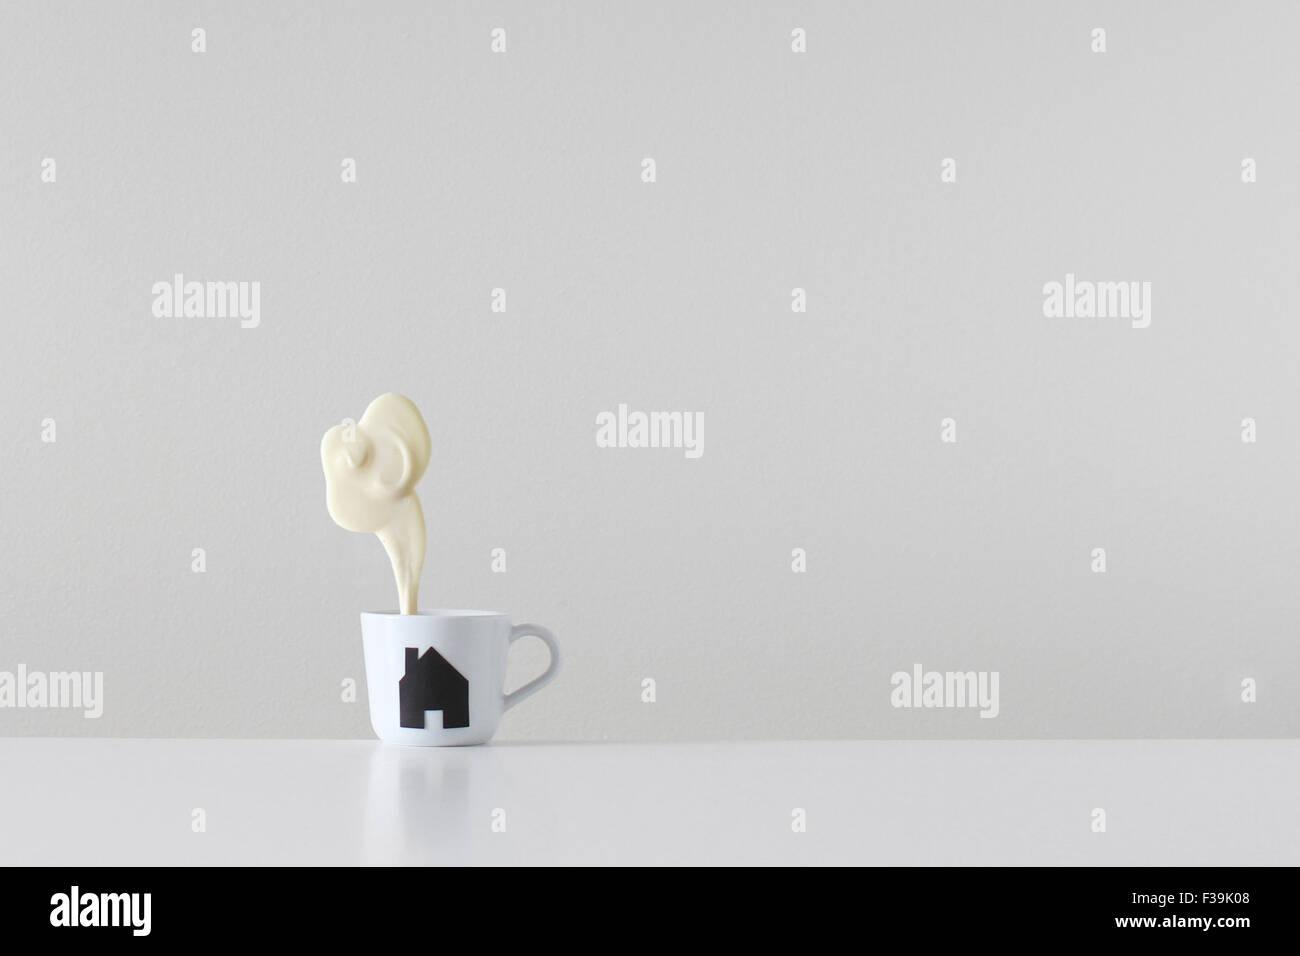 Home brew, taza de té con la silueta de la casa de vapor e impresión hecha de chocolate blanco procedente Imagen De Stock